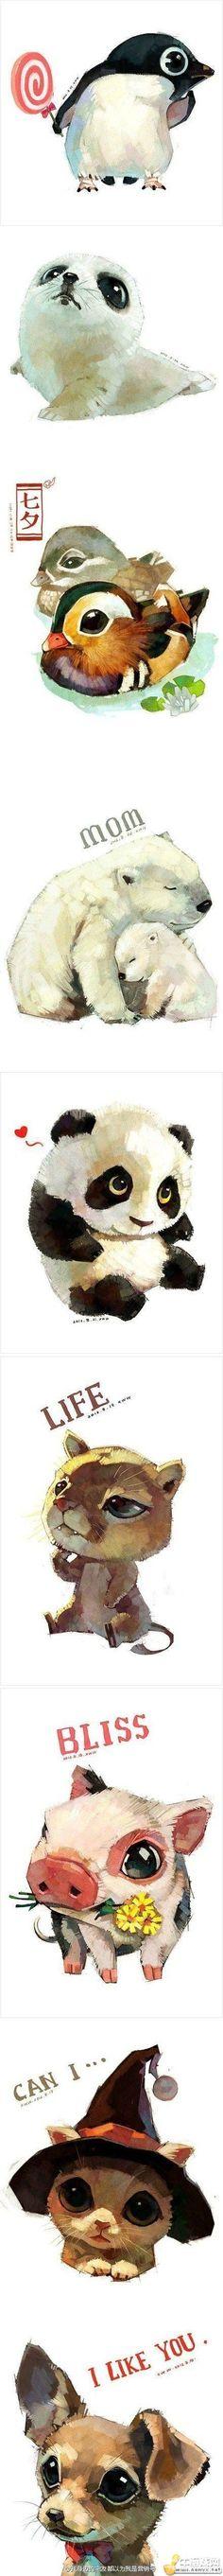 baby Animal paintings